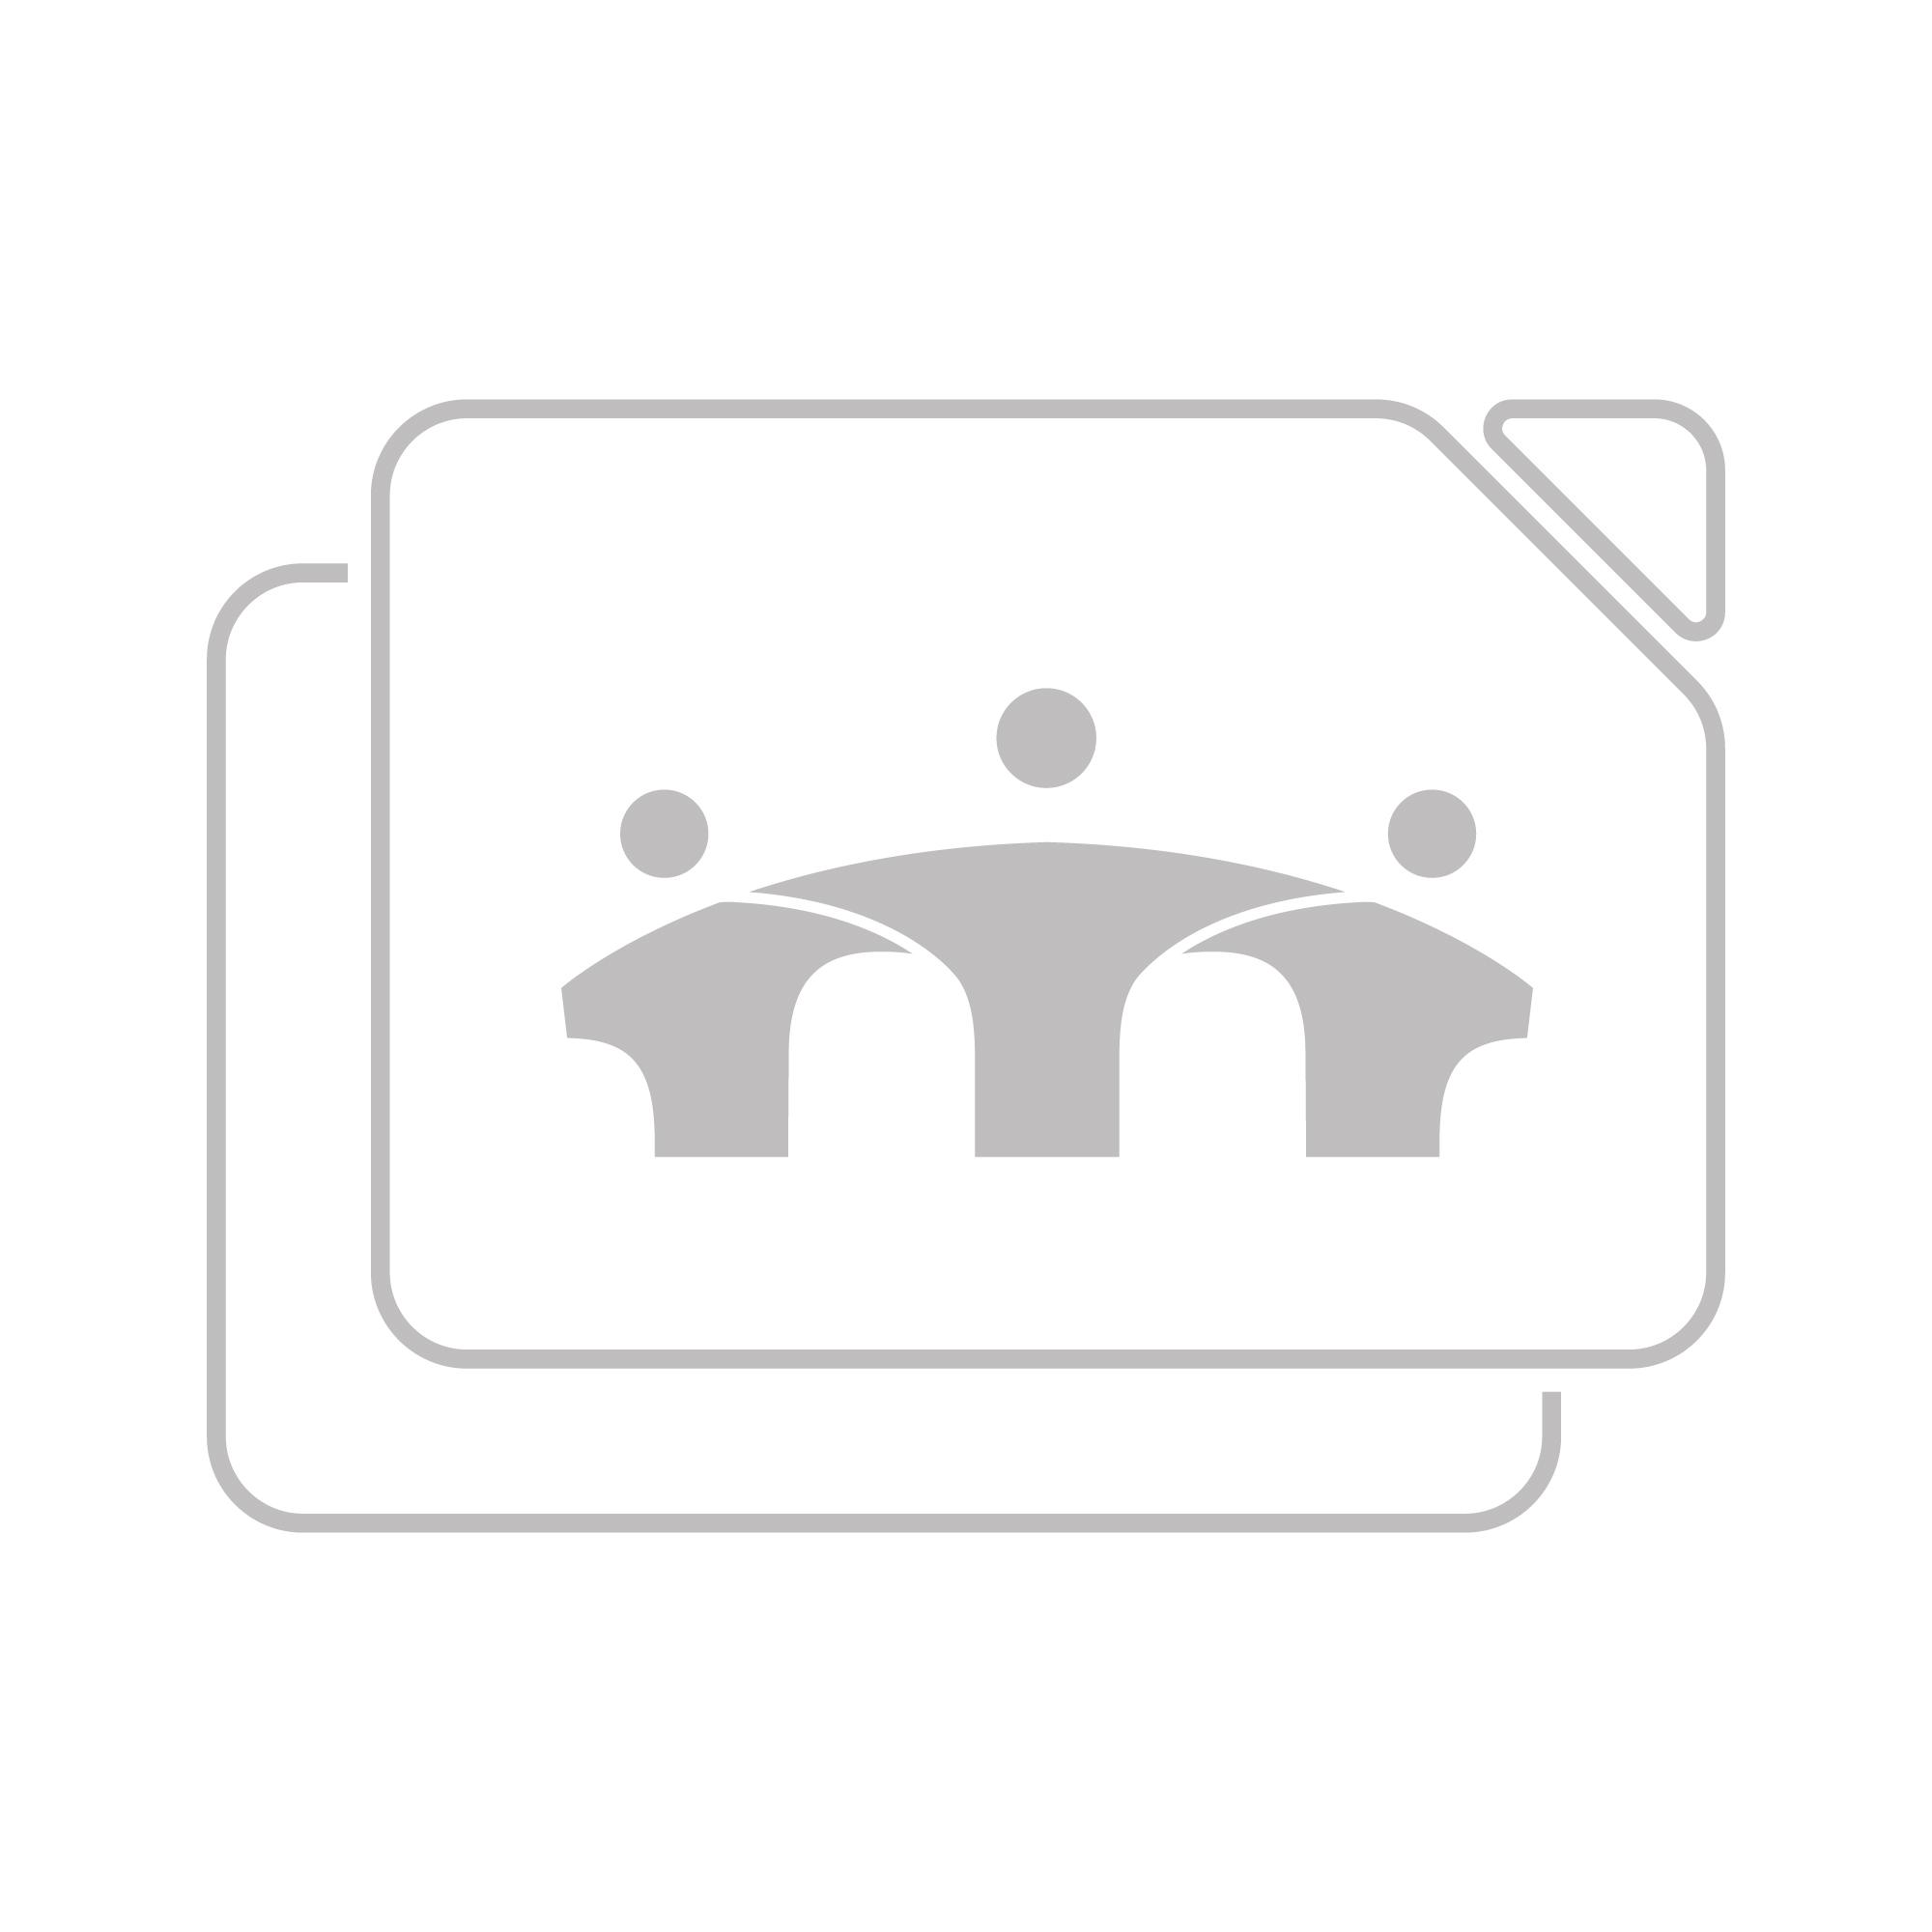 Logitech K380 for Mac Multi-Device Bluetooth Keyboard - ROSE - UK - INTNL